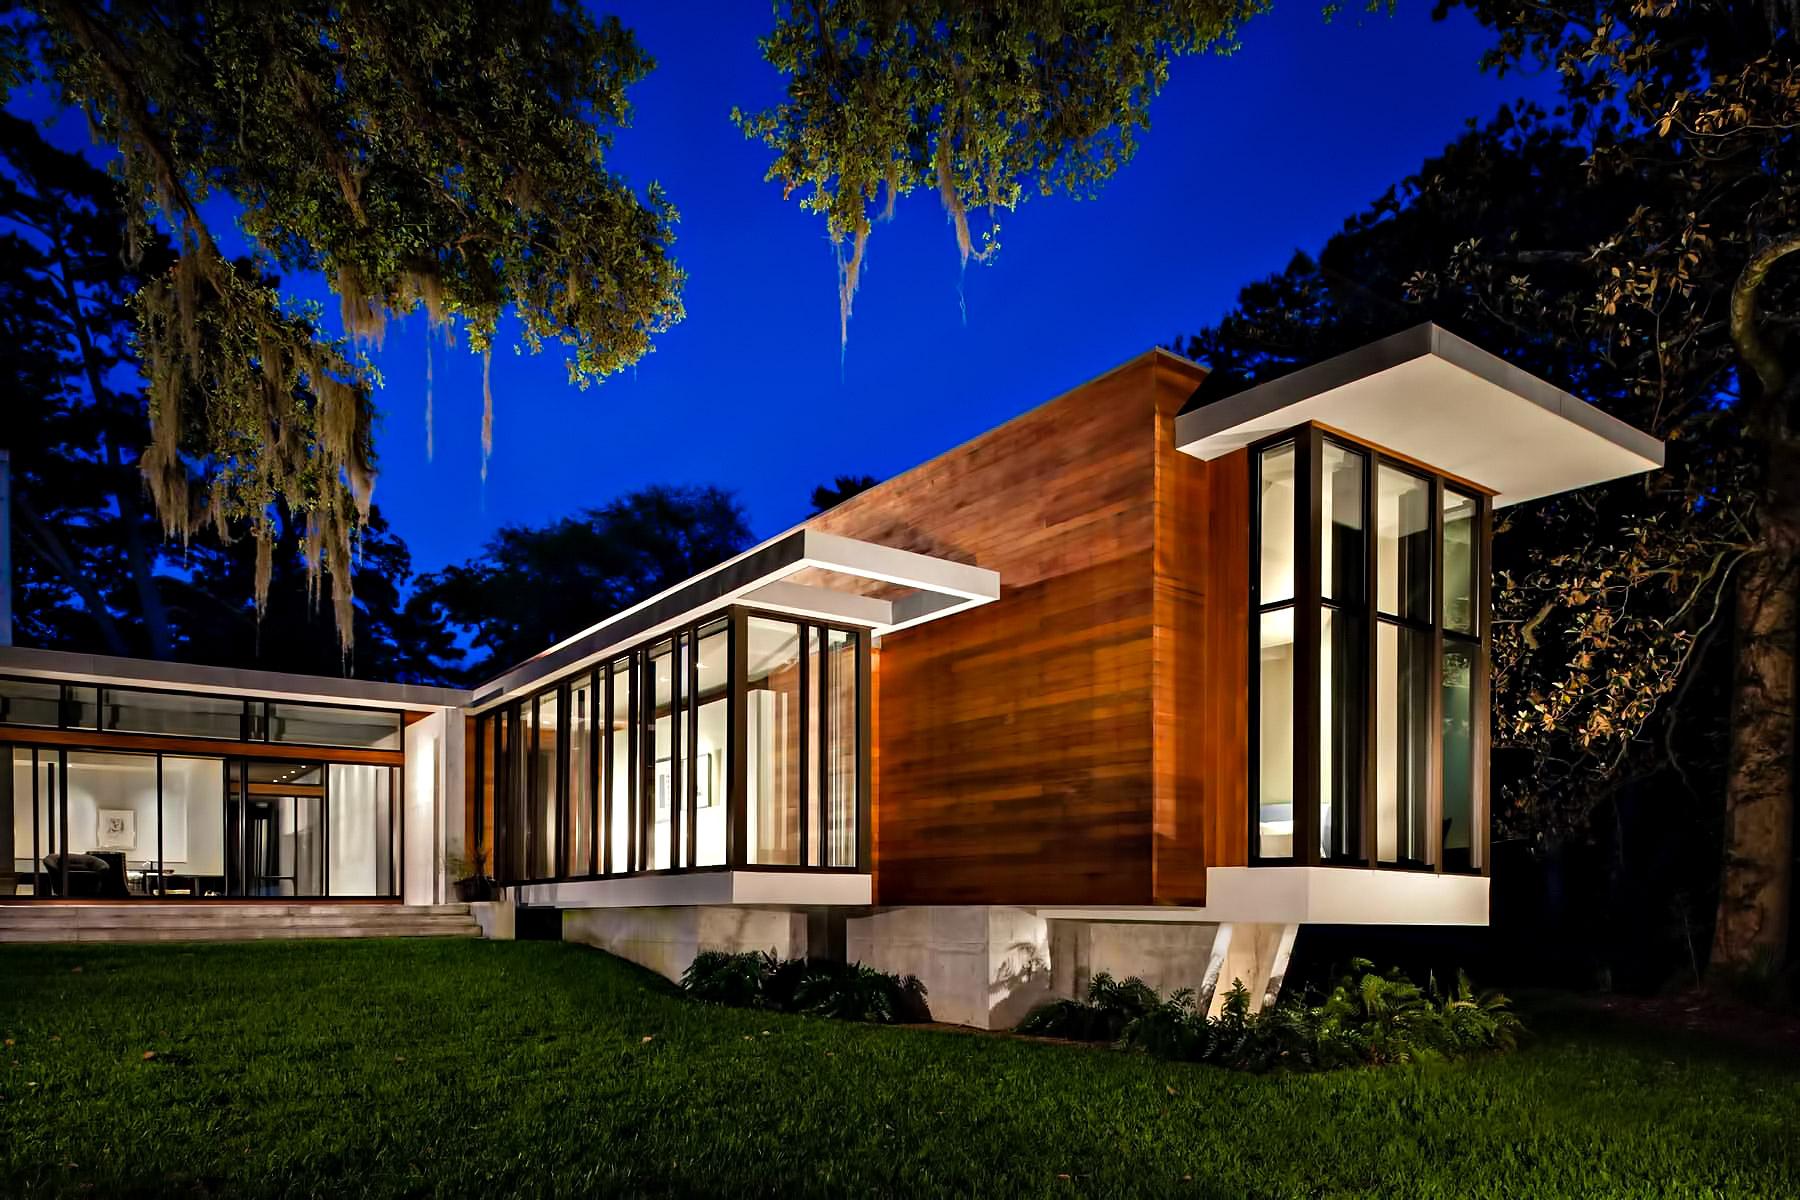 Brays Island II Residence - Brays Island Plantation, Sheldon, SC, USA